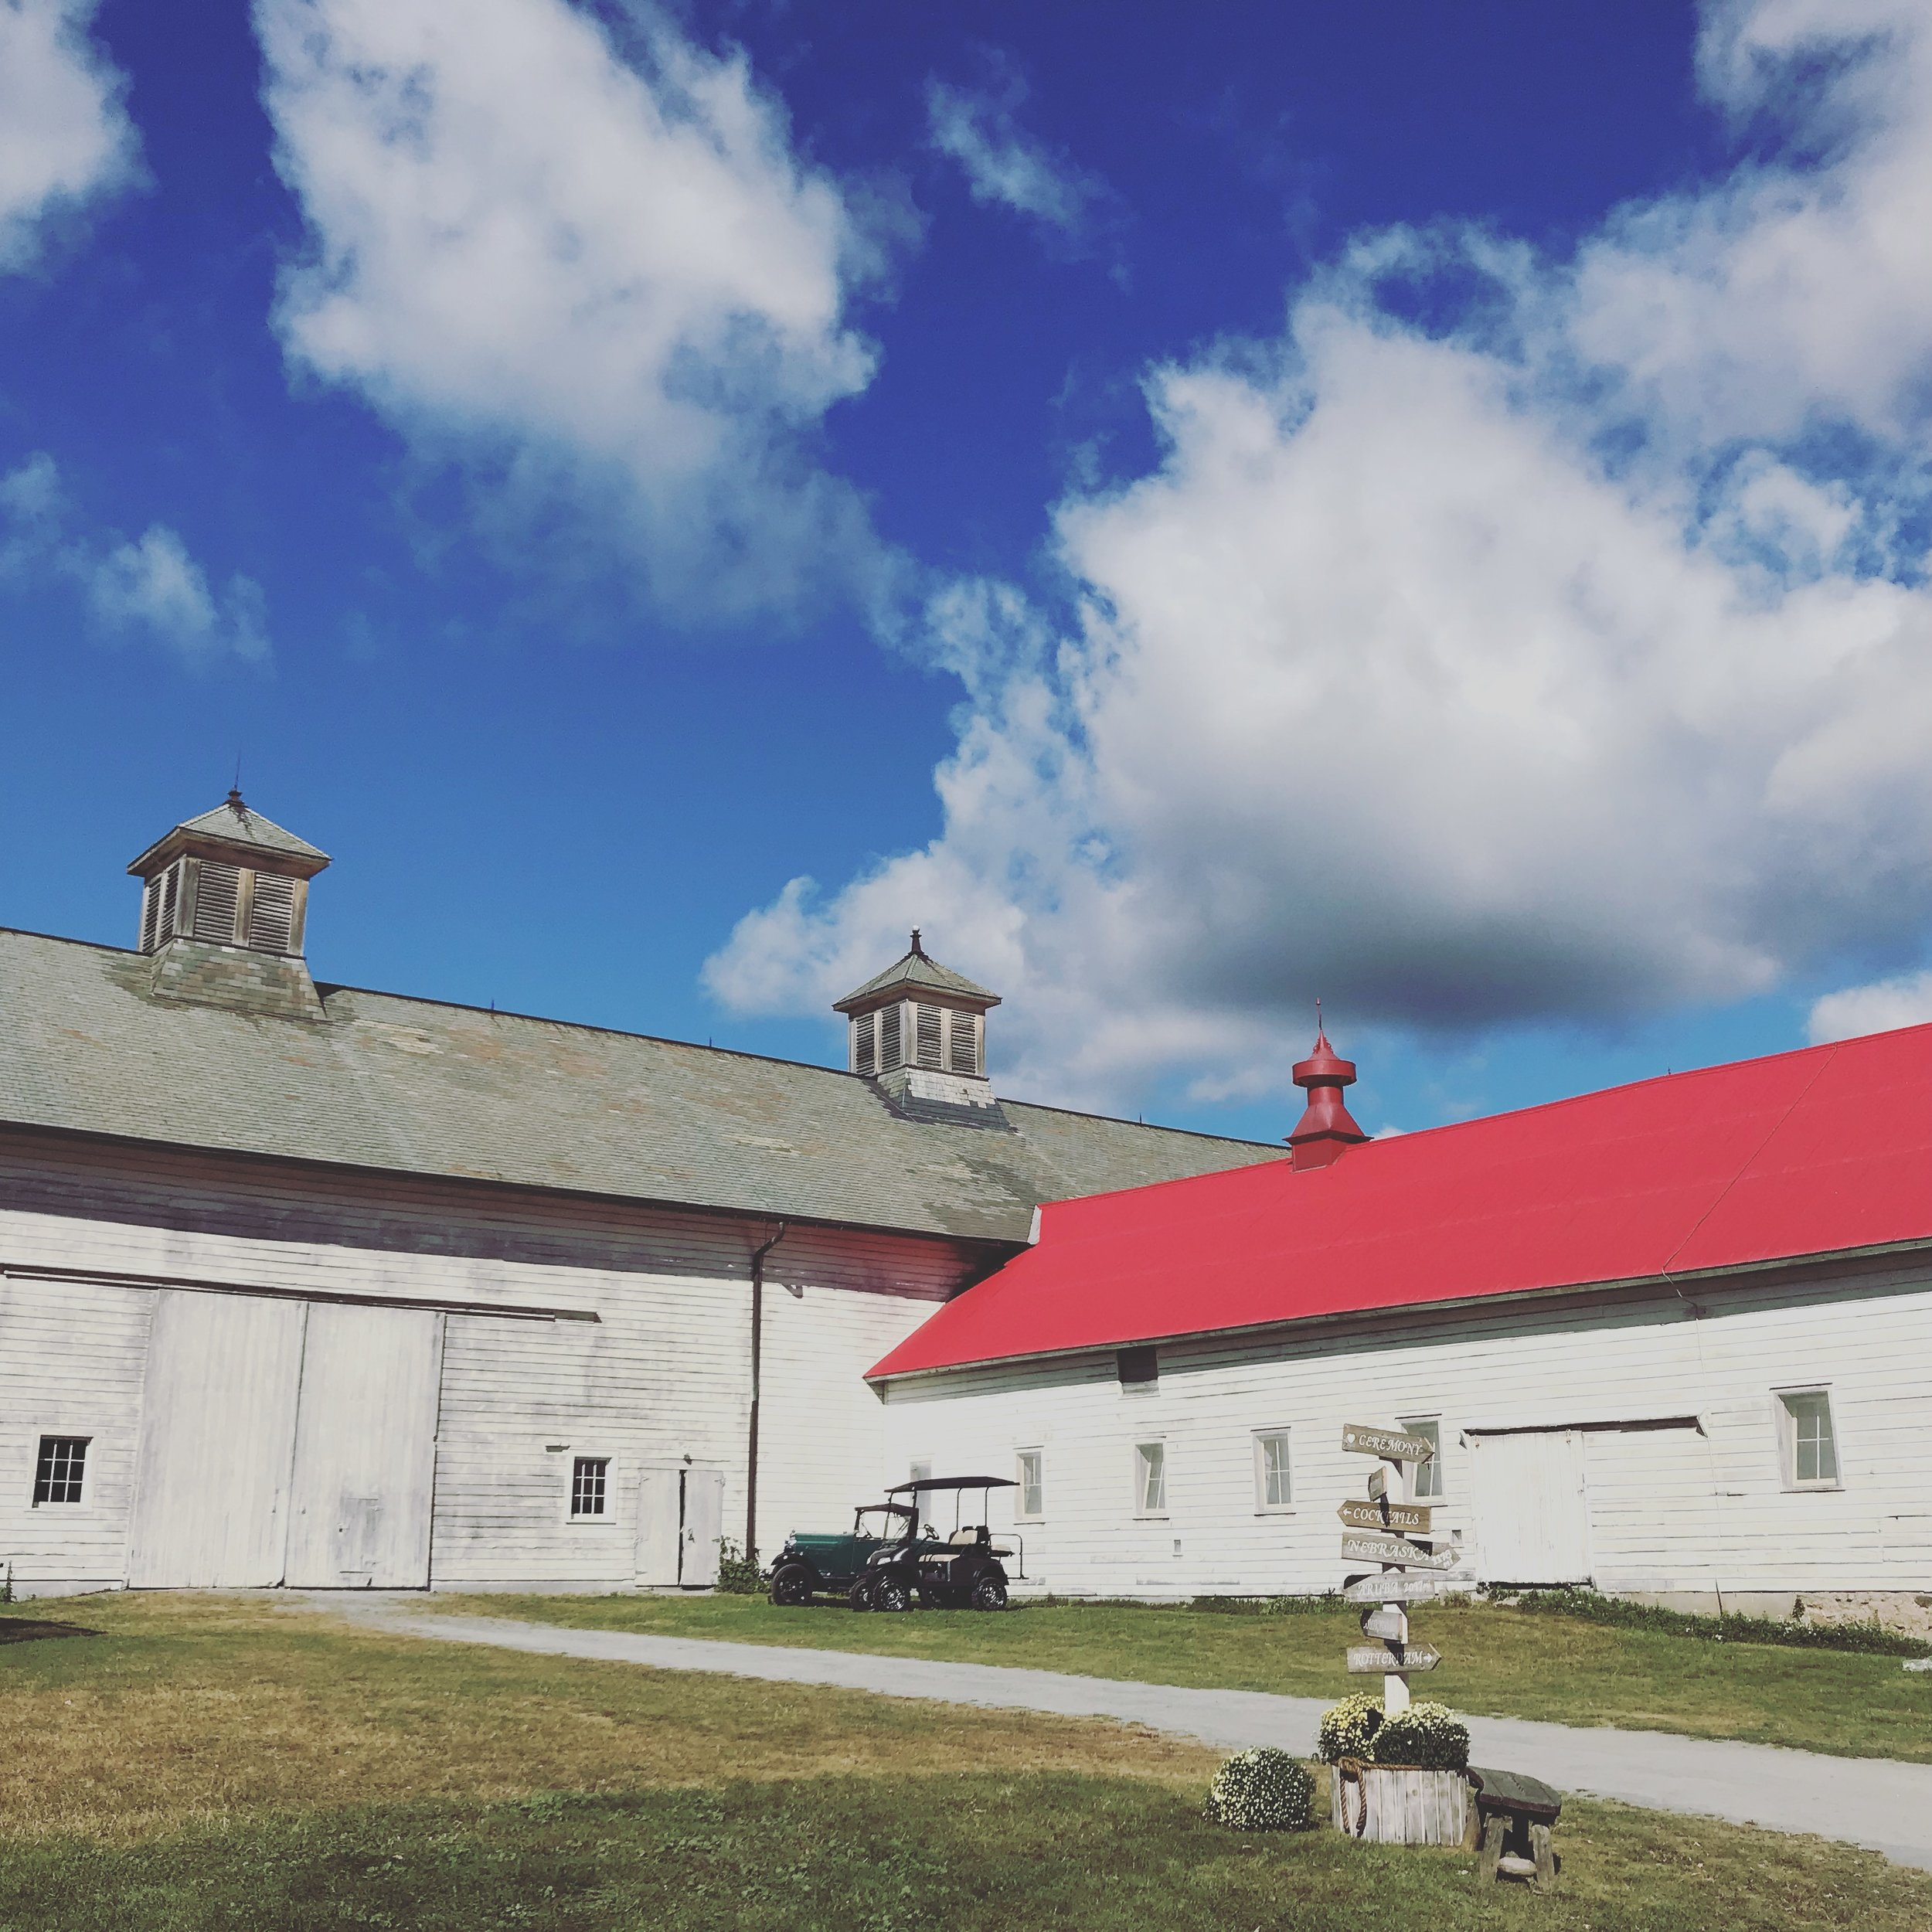 shaker_heritage_barn_004.JPG